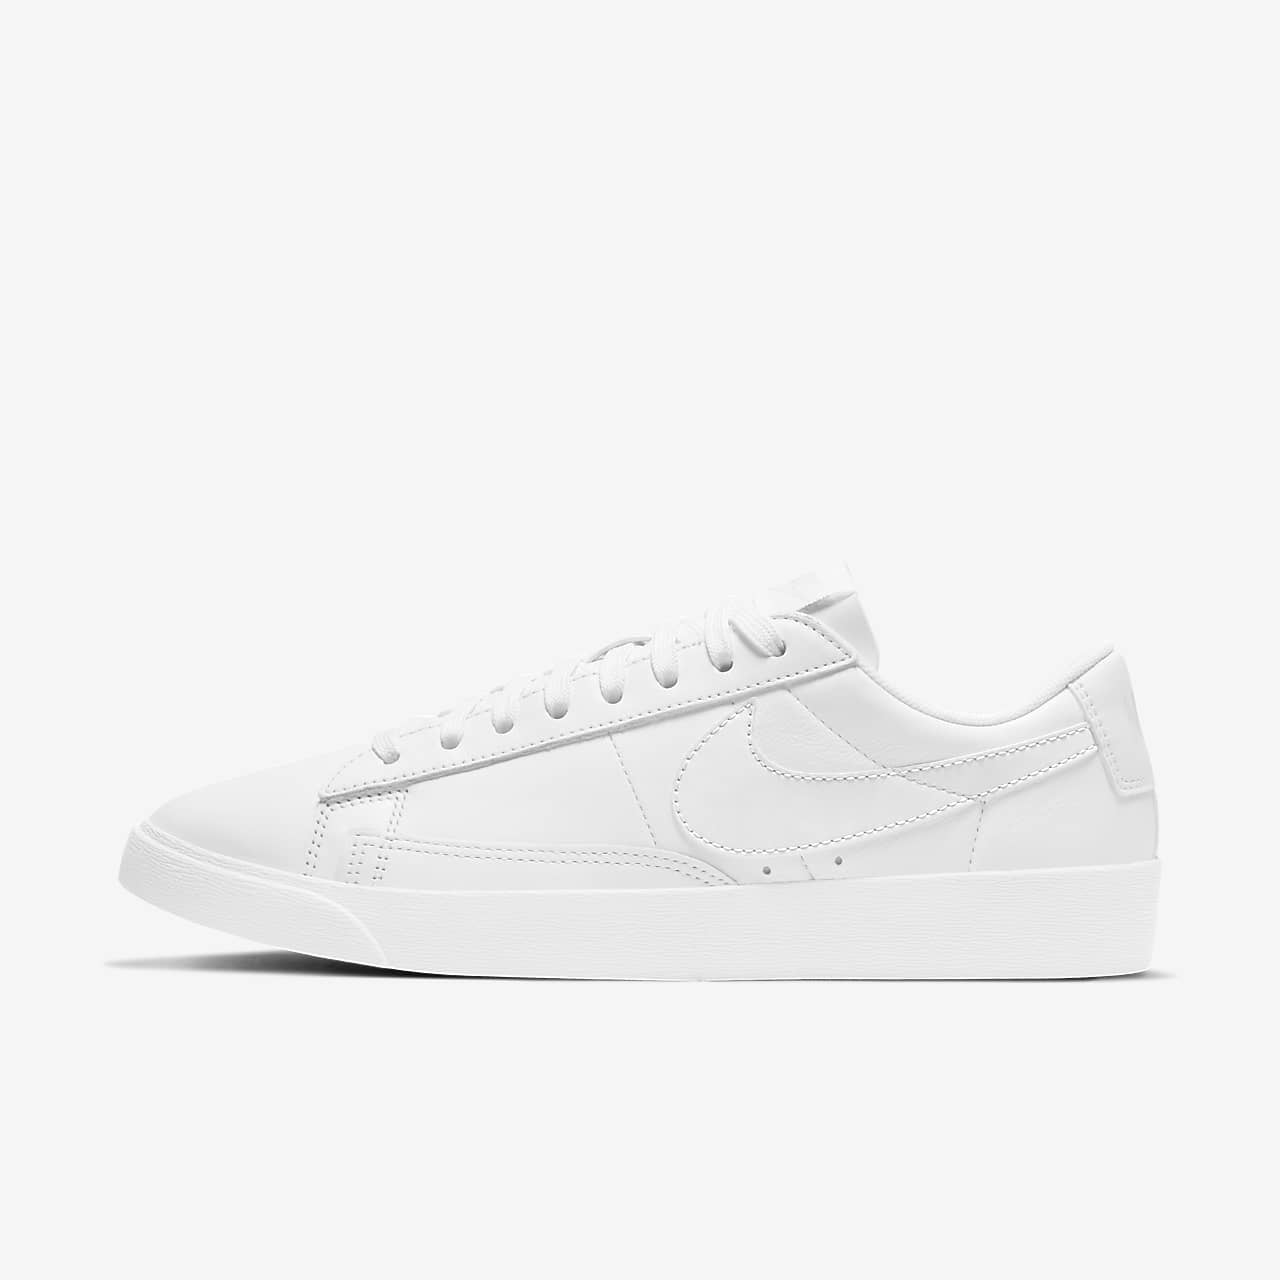 Sko Nike Blazer Low LE för kvinnor